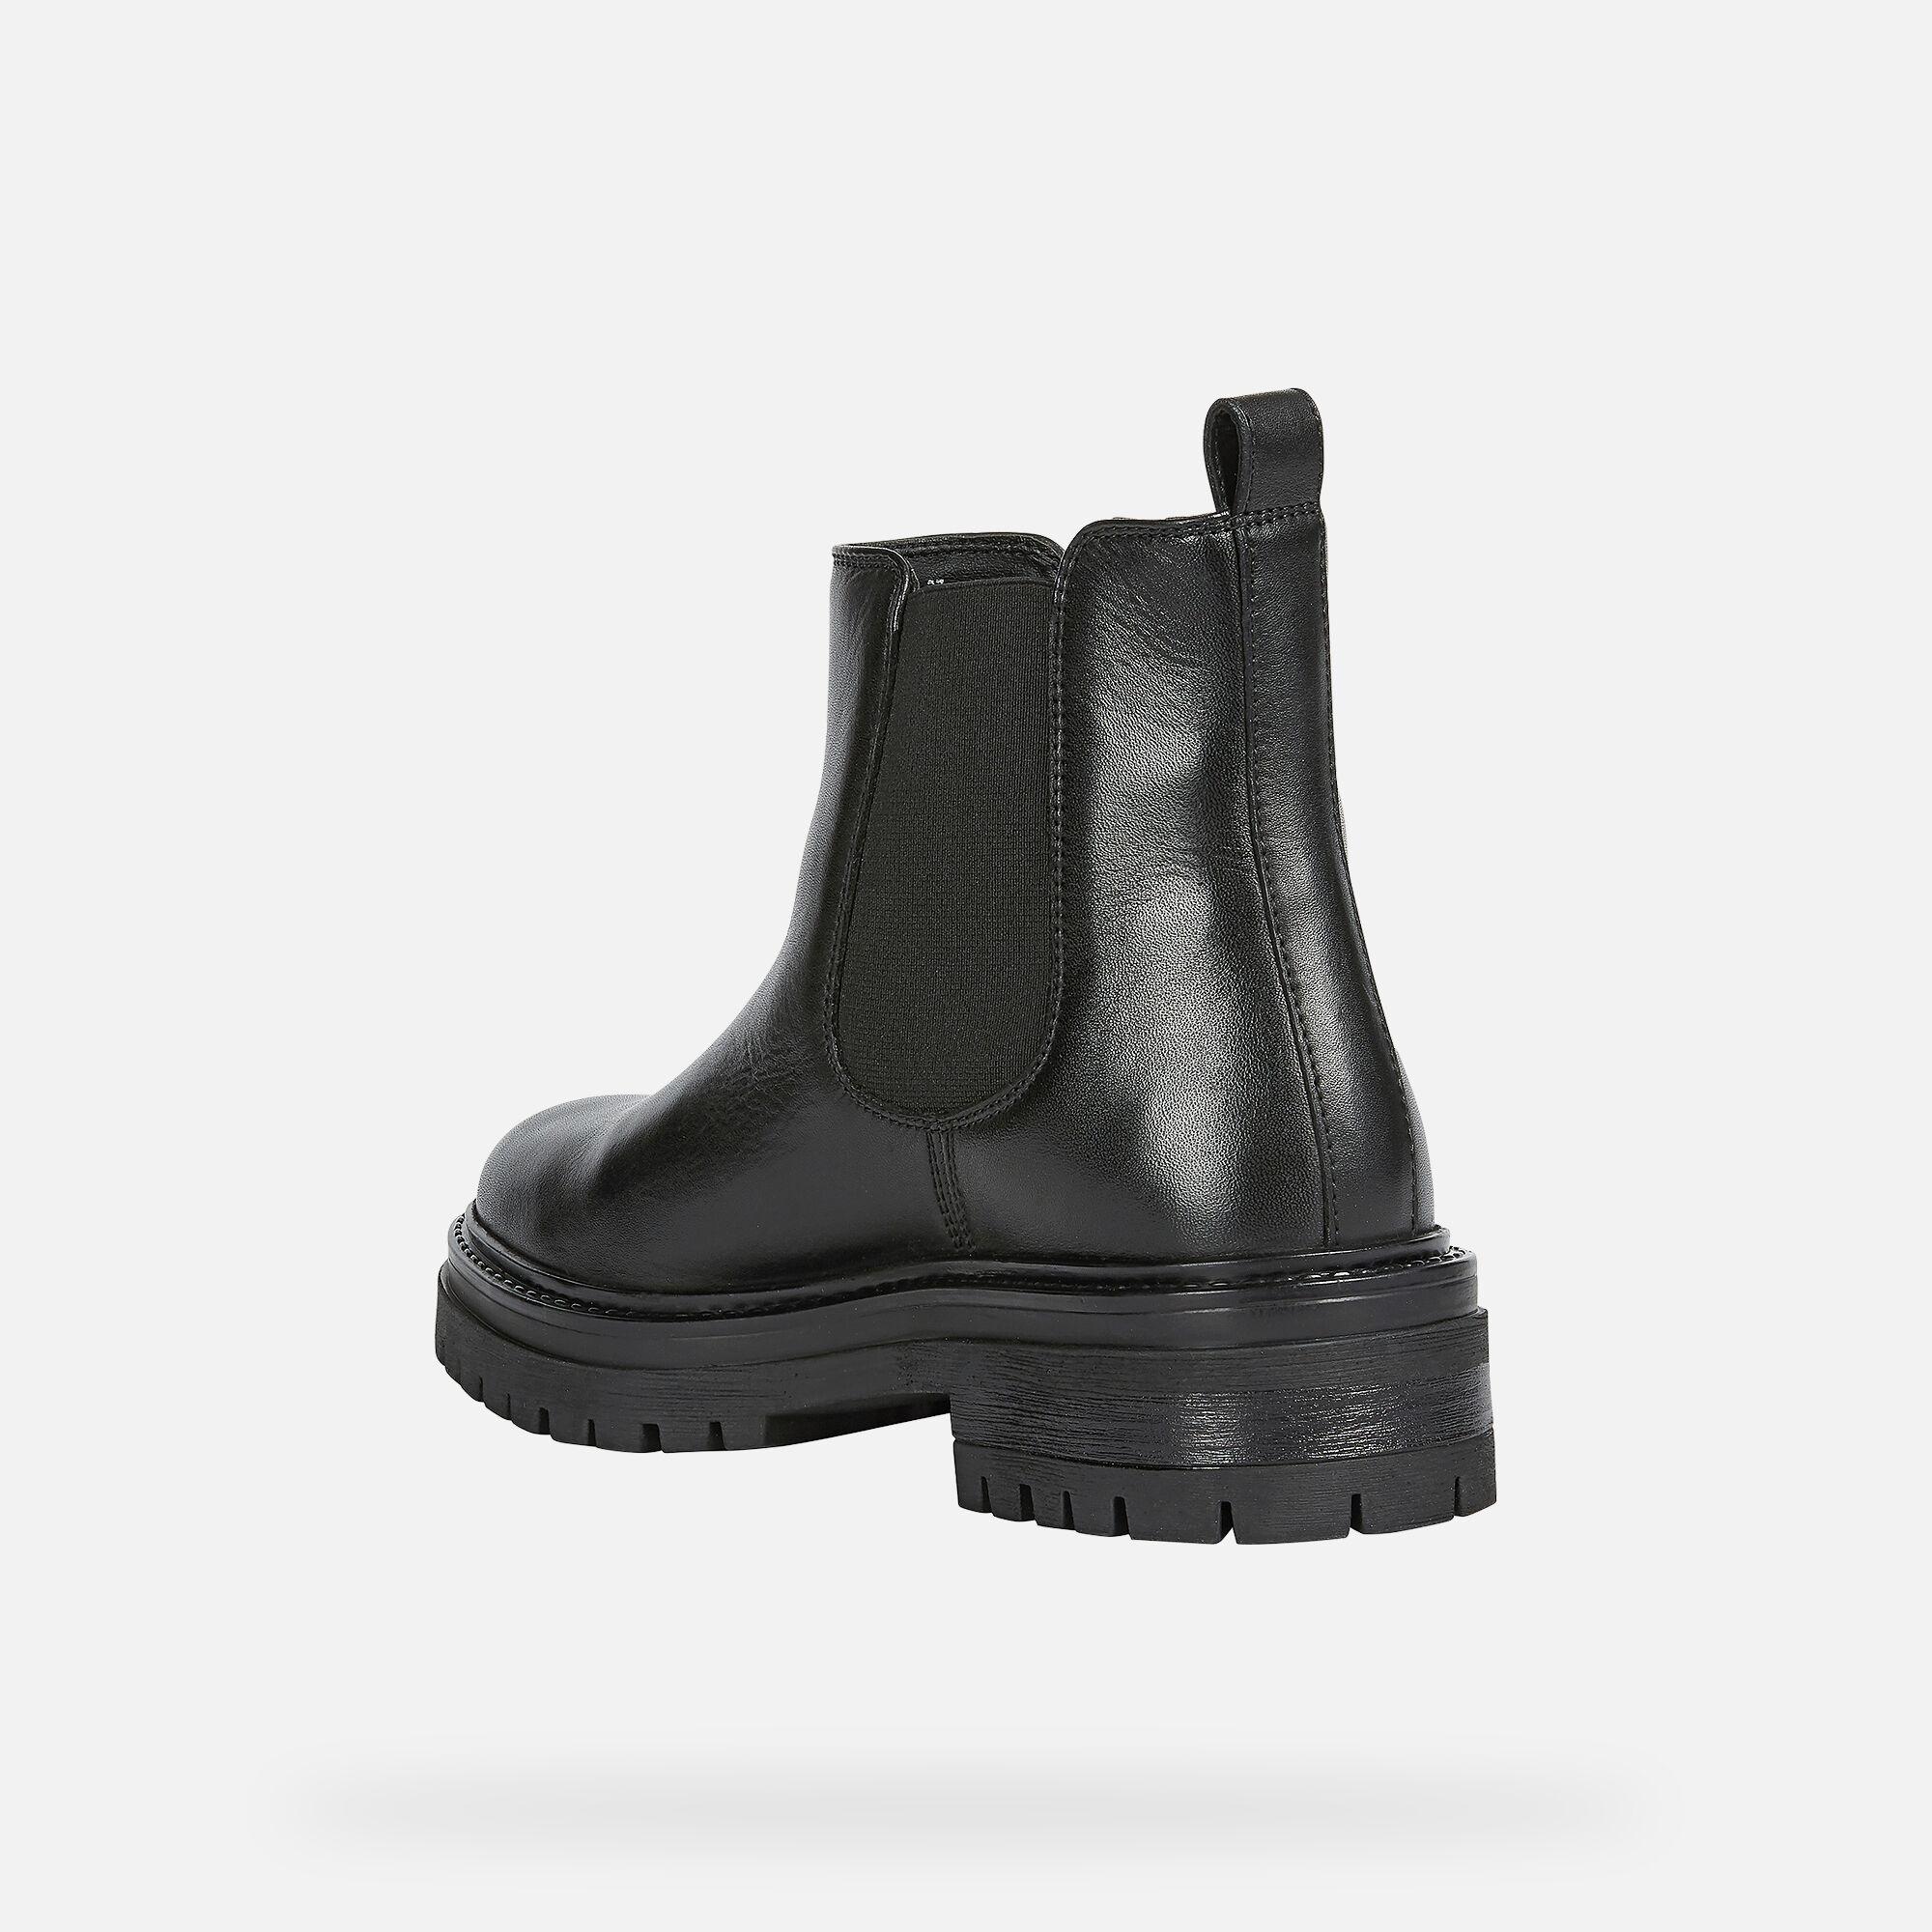 Geox IRIDEA Woman: Black Ankle Boots